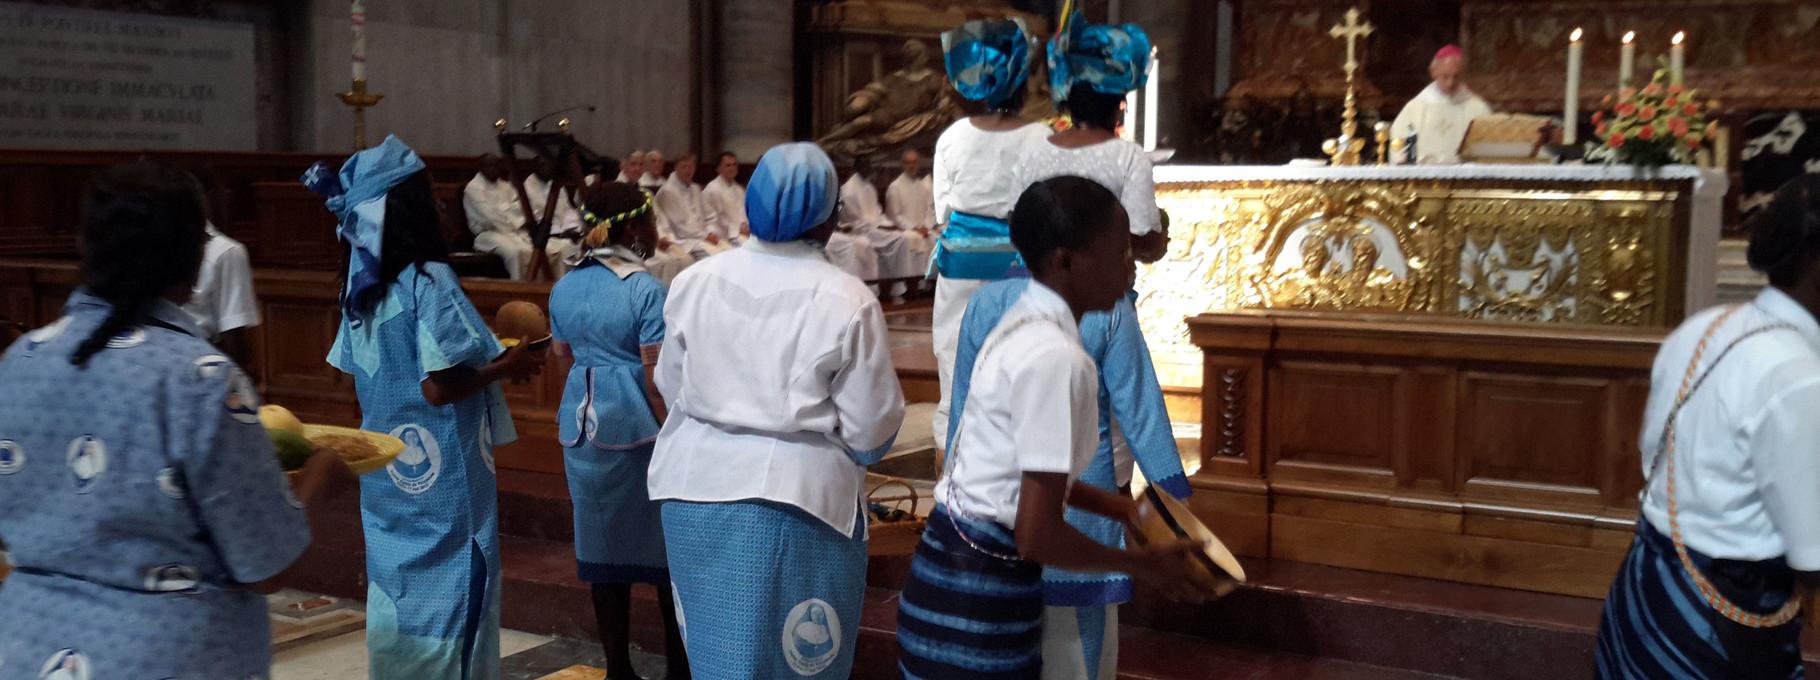 Offertoire : Eucharistie au Vatican